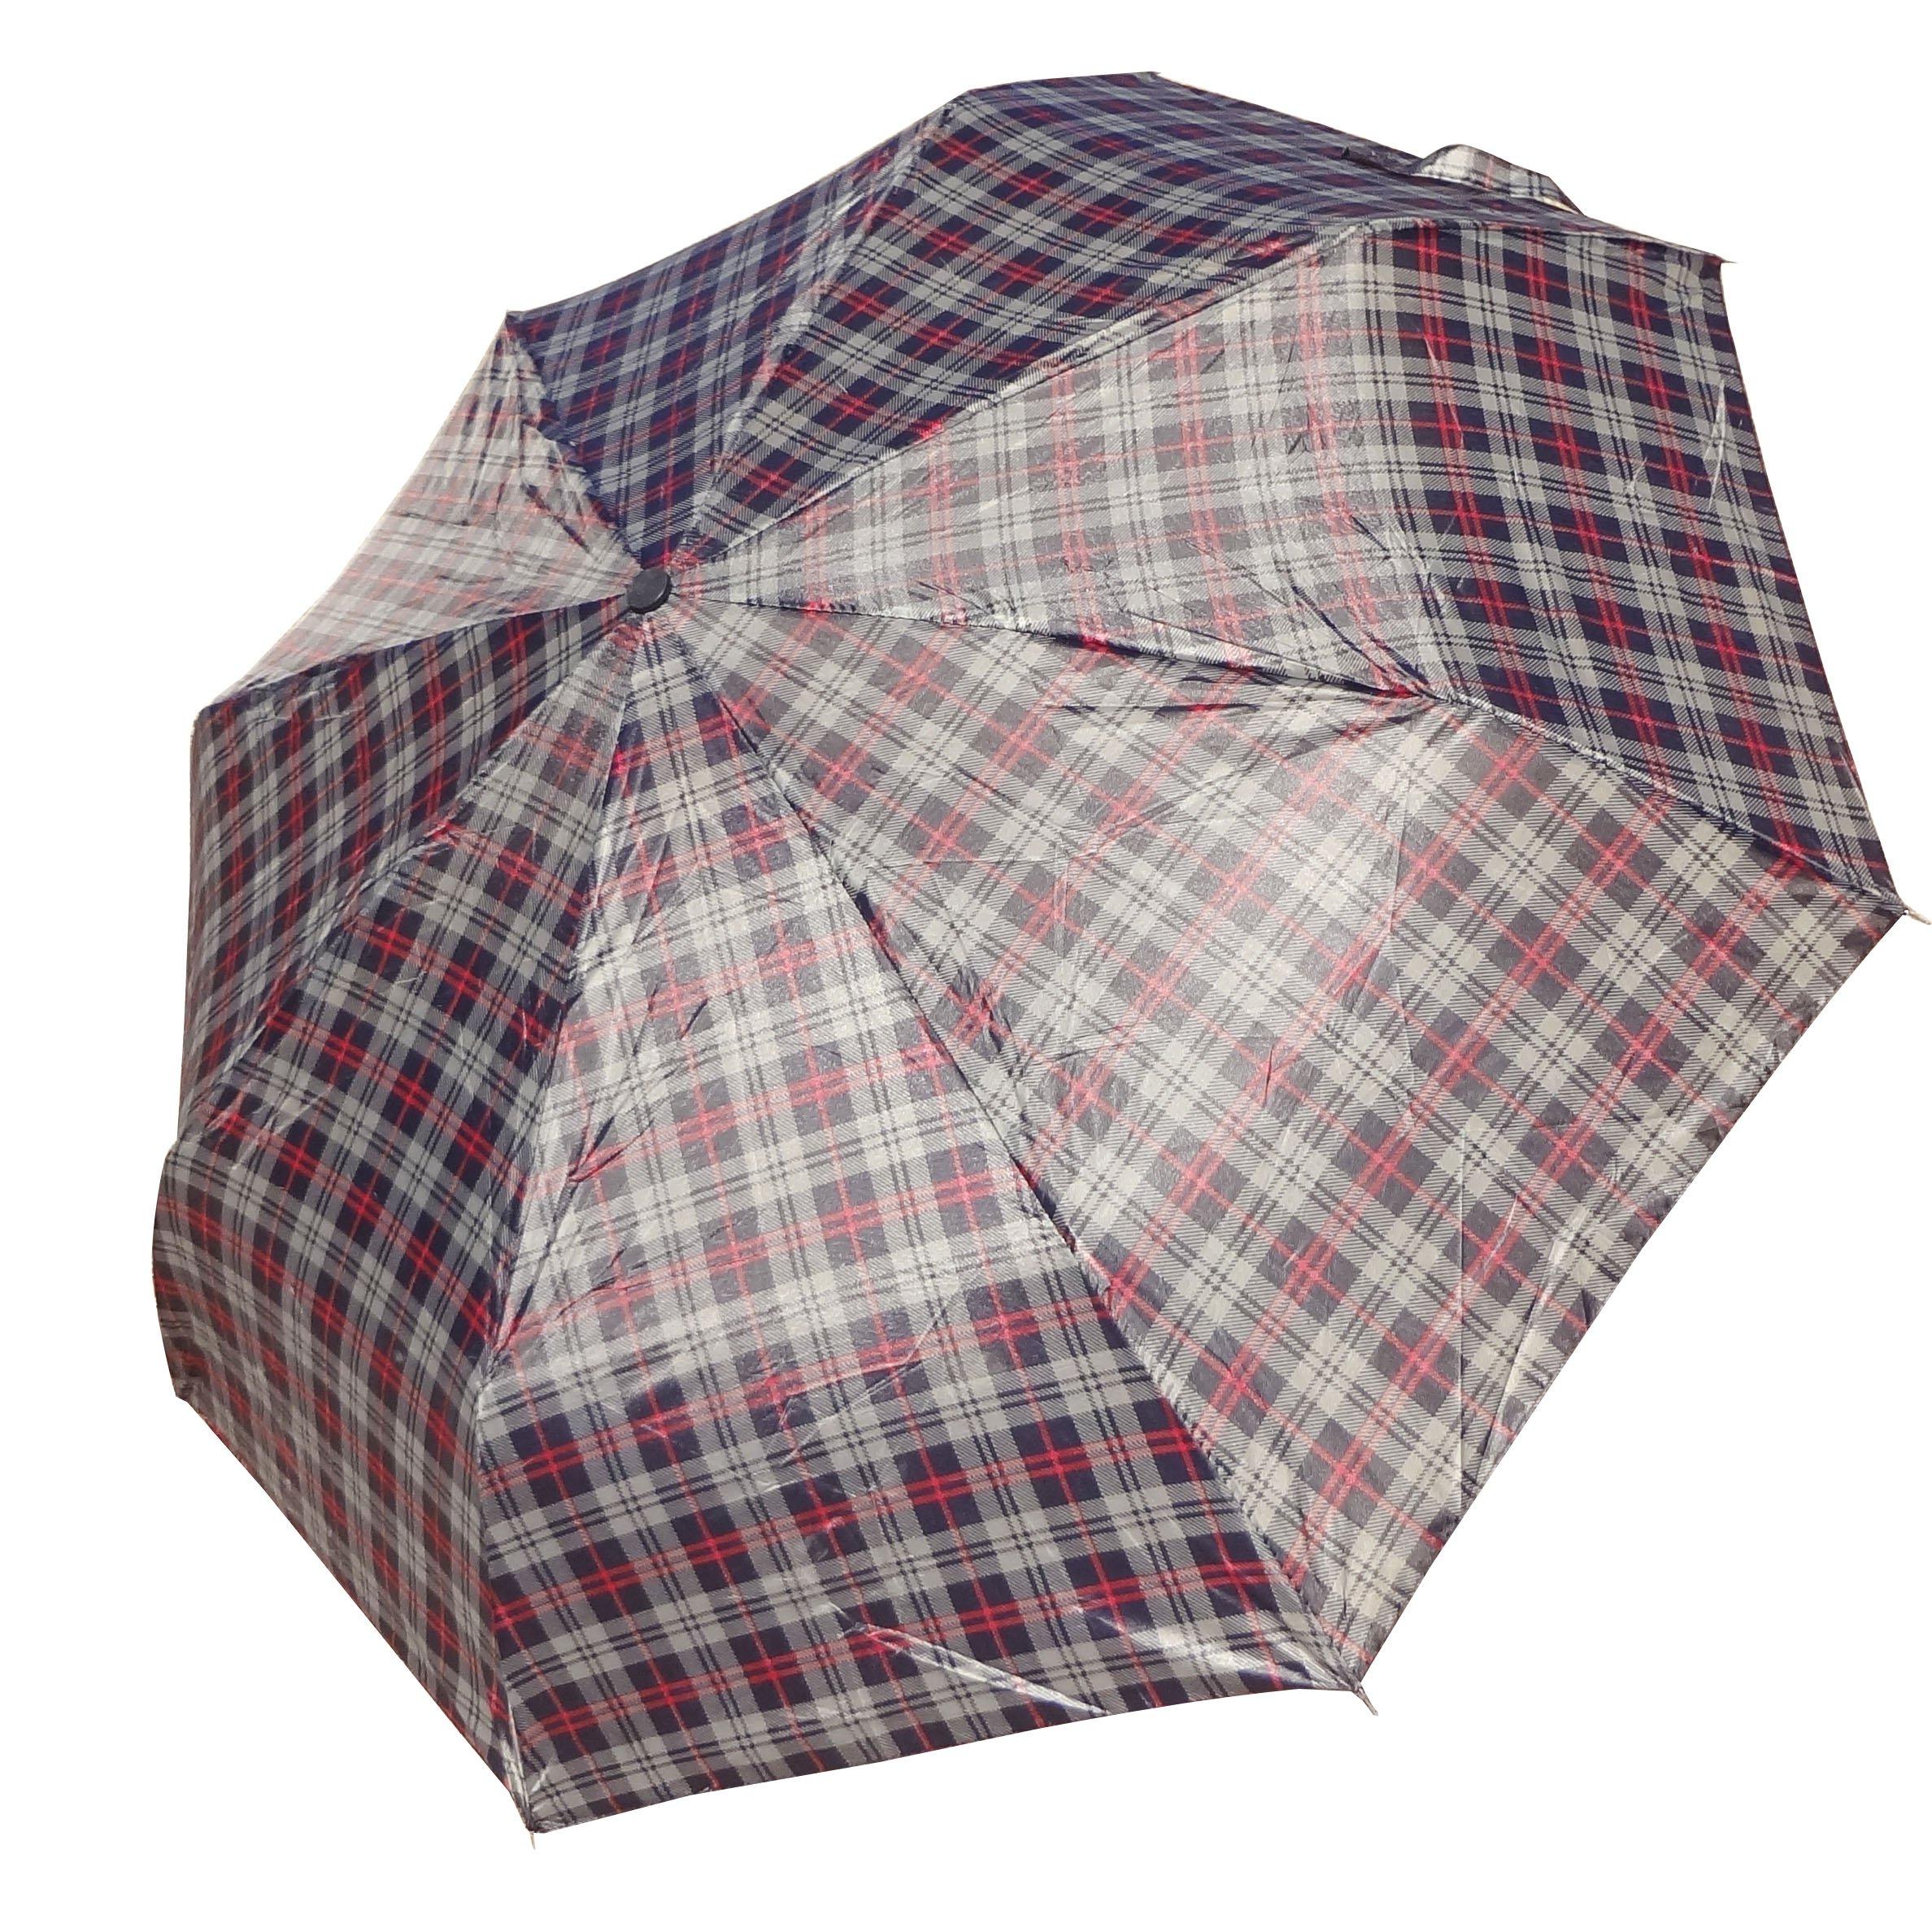 Best Handy Blue Plaid Designer Stylish Rain Sun Summer Umbrella Back to School Gift Idea